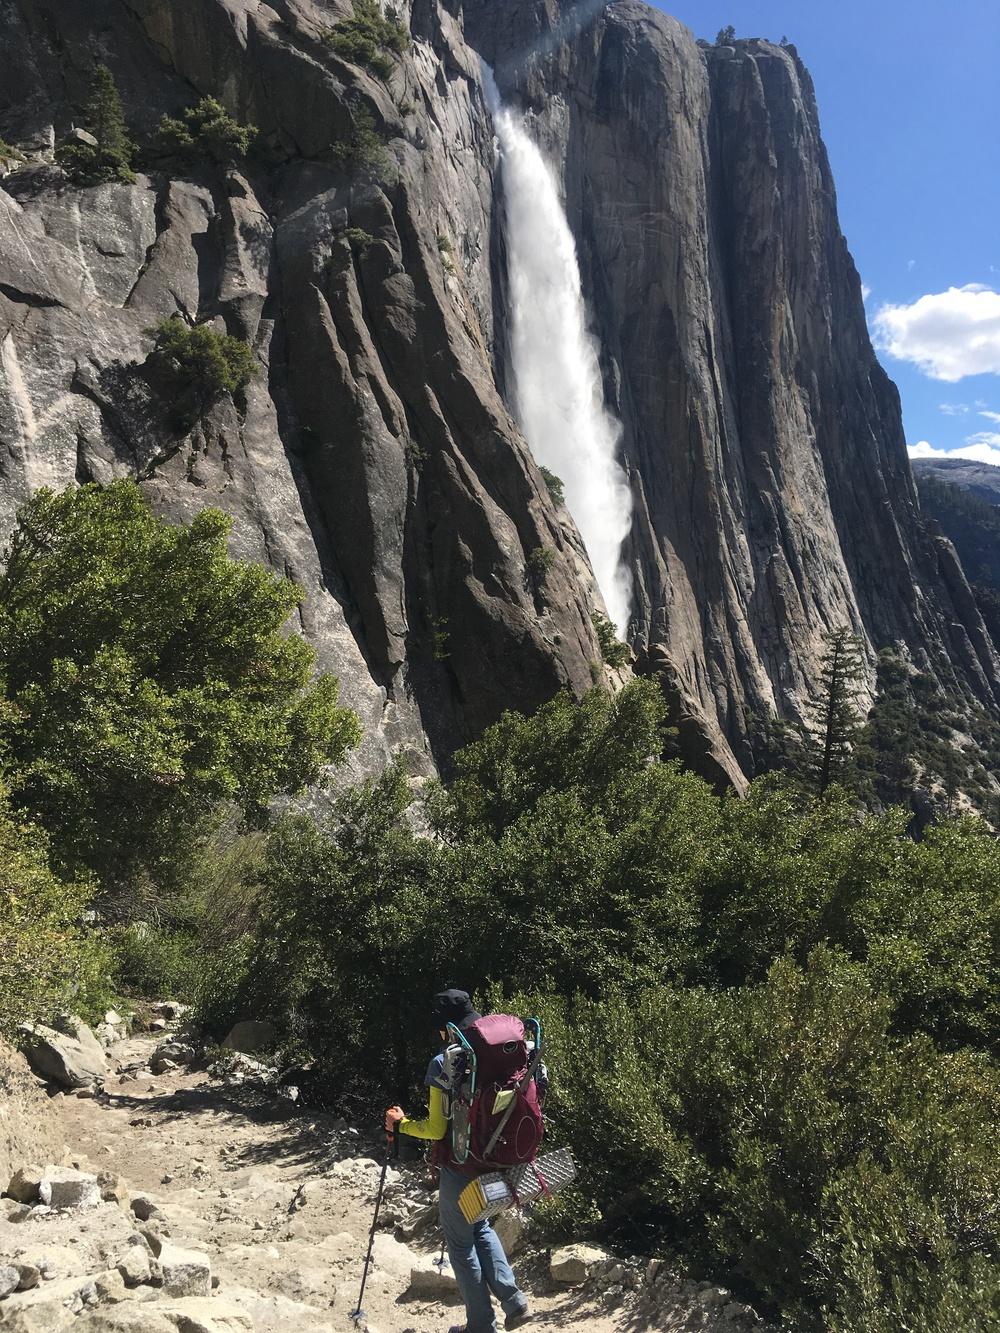 Cheri hiking the switchbacks towards the base of Yosemite Falls